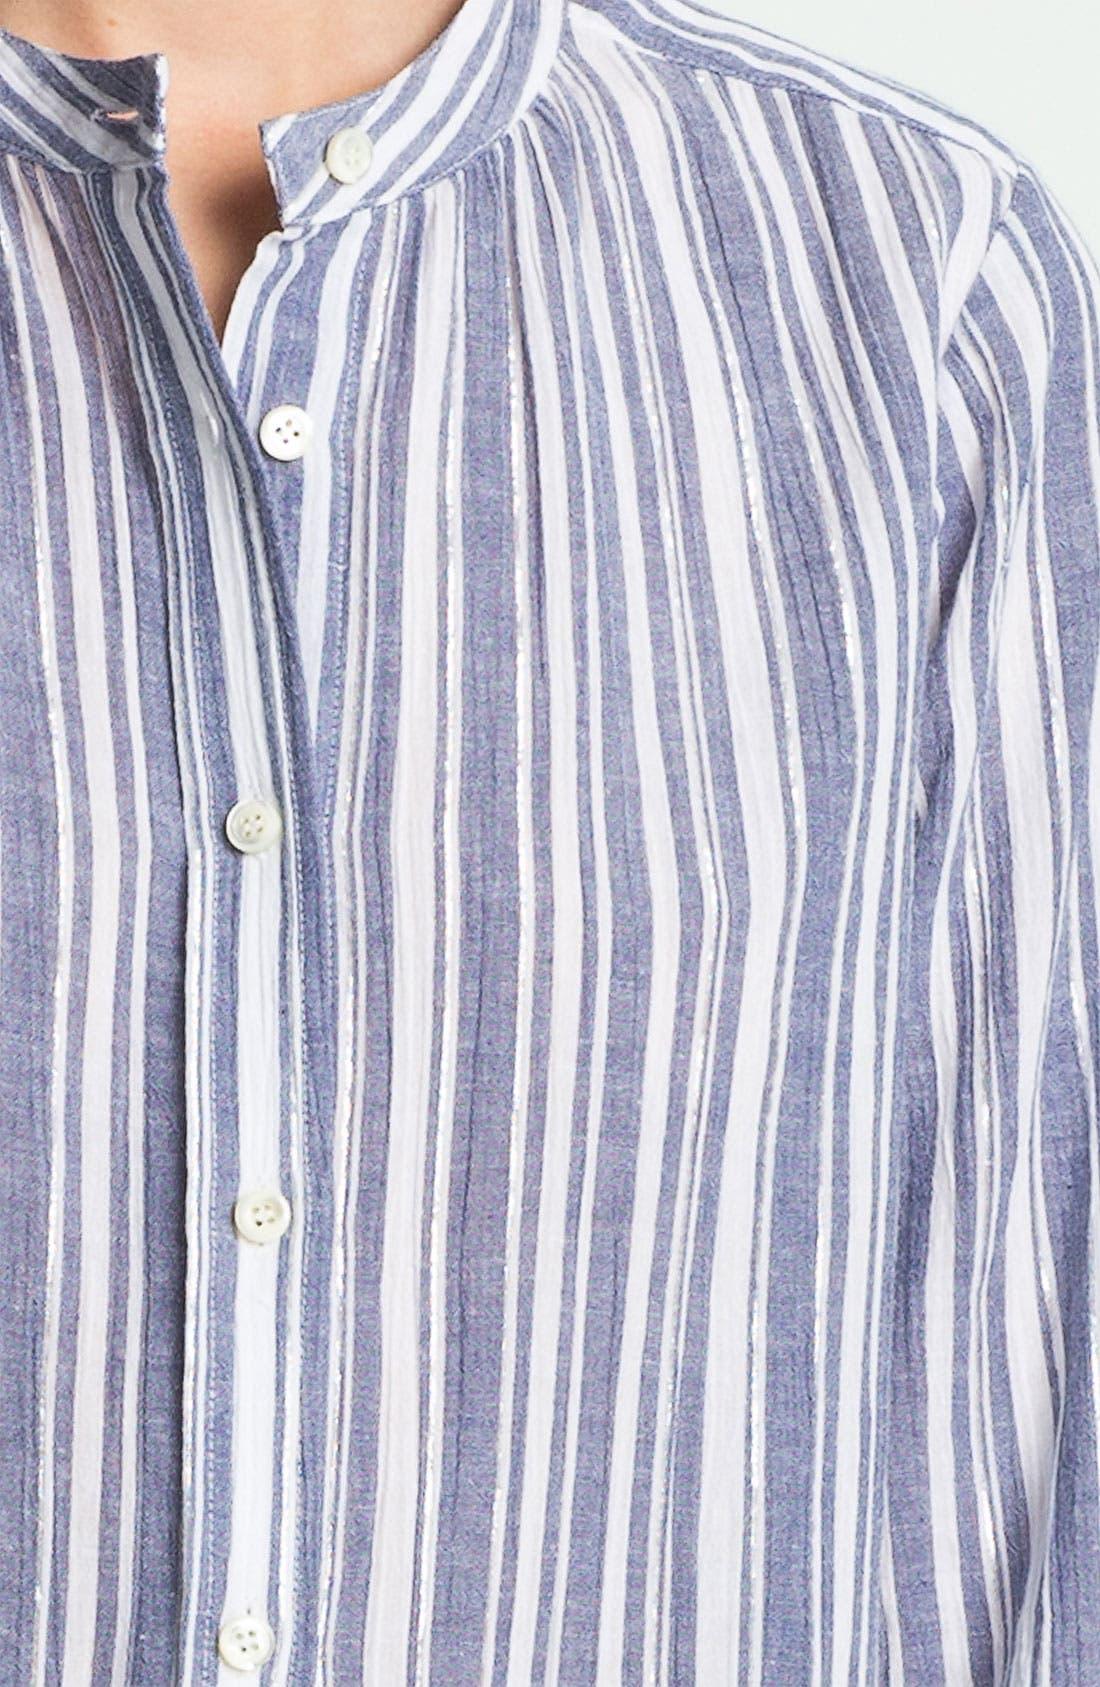 Alternate Image 3  - A.P.C. Metallic Stripe Blouse